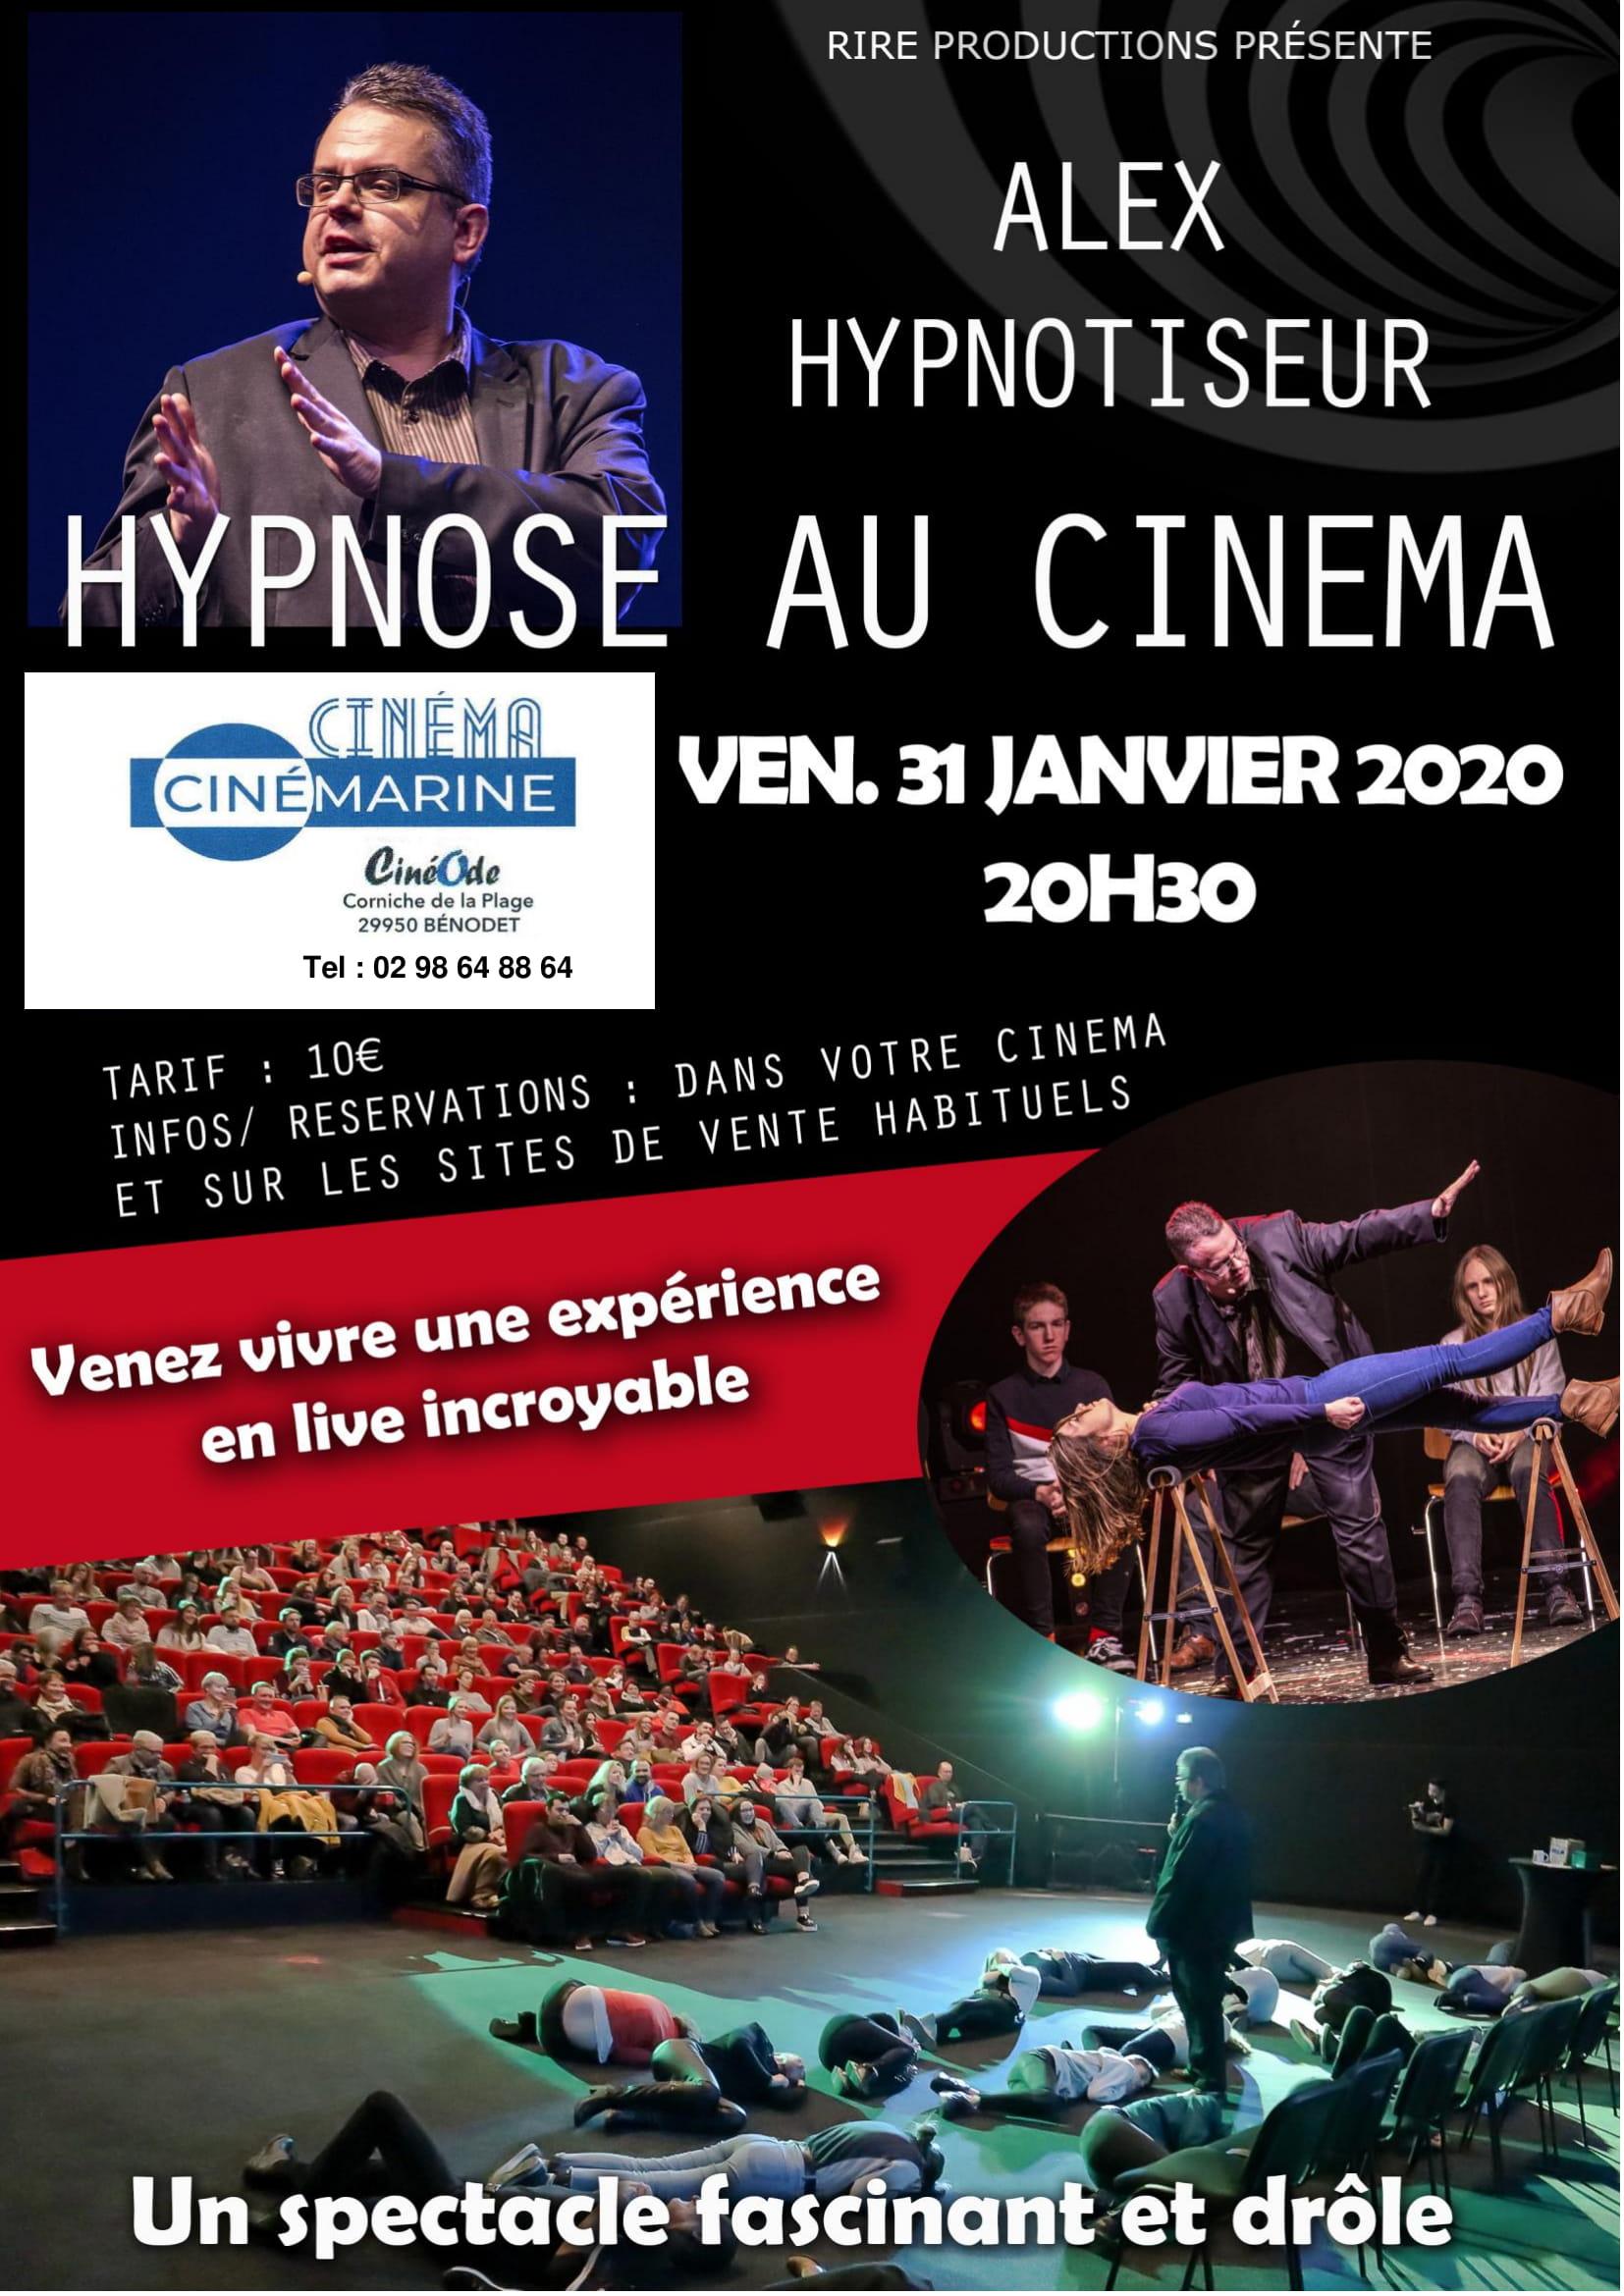 Hypnose au Cinéma